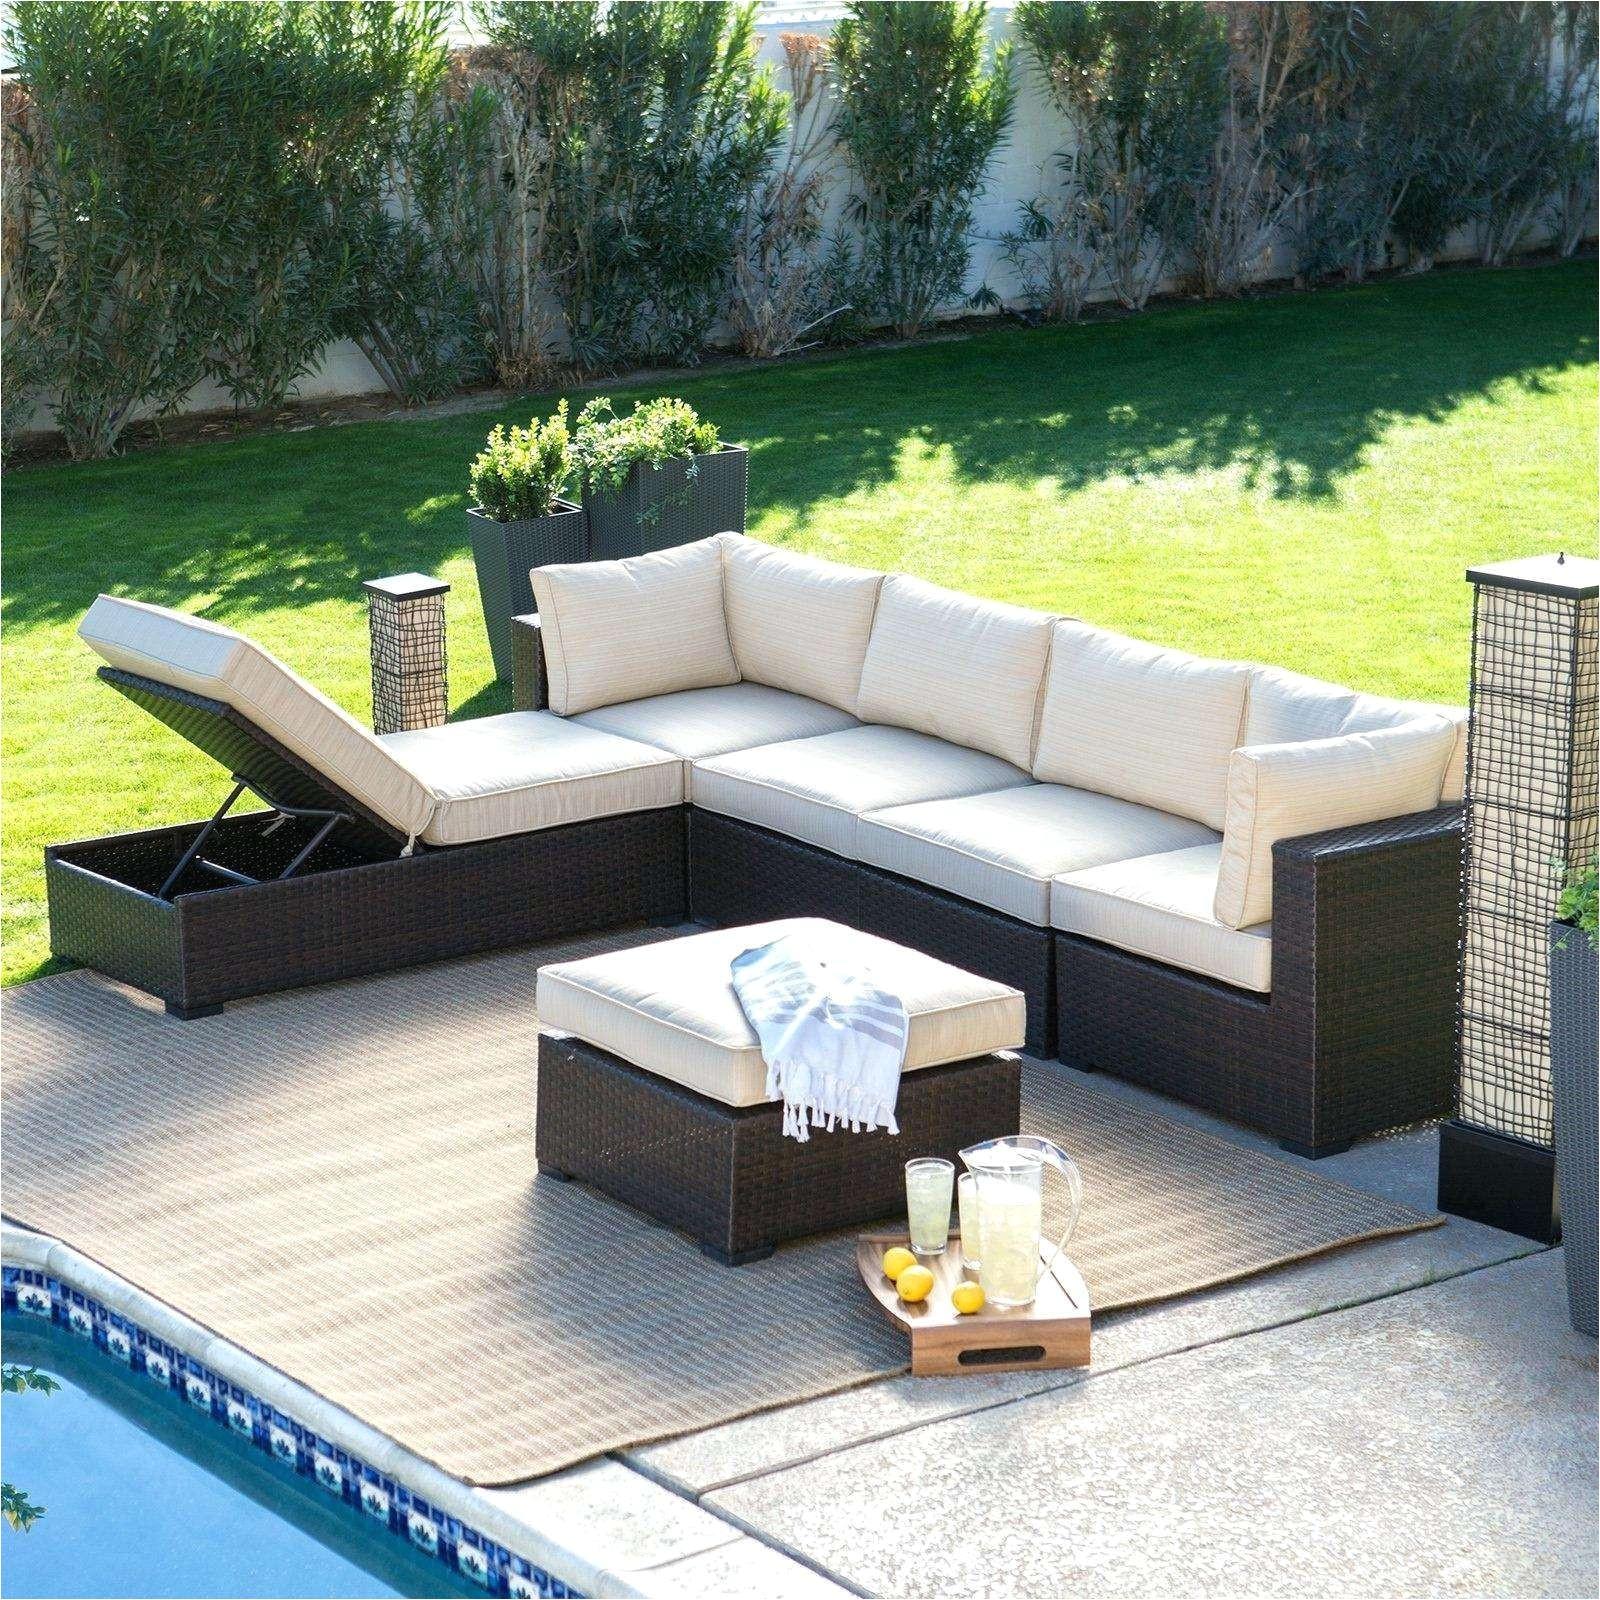 Diy 2×4 Patio Furniture 15 Diy Pallet Furniture Ideas Tips Economyinnbeebe  Com